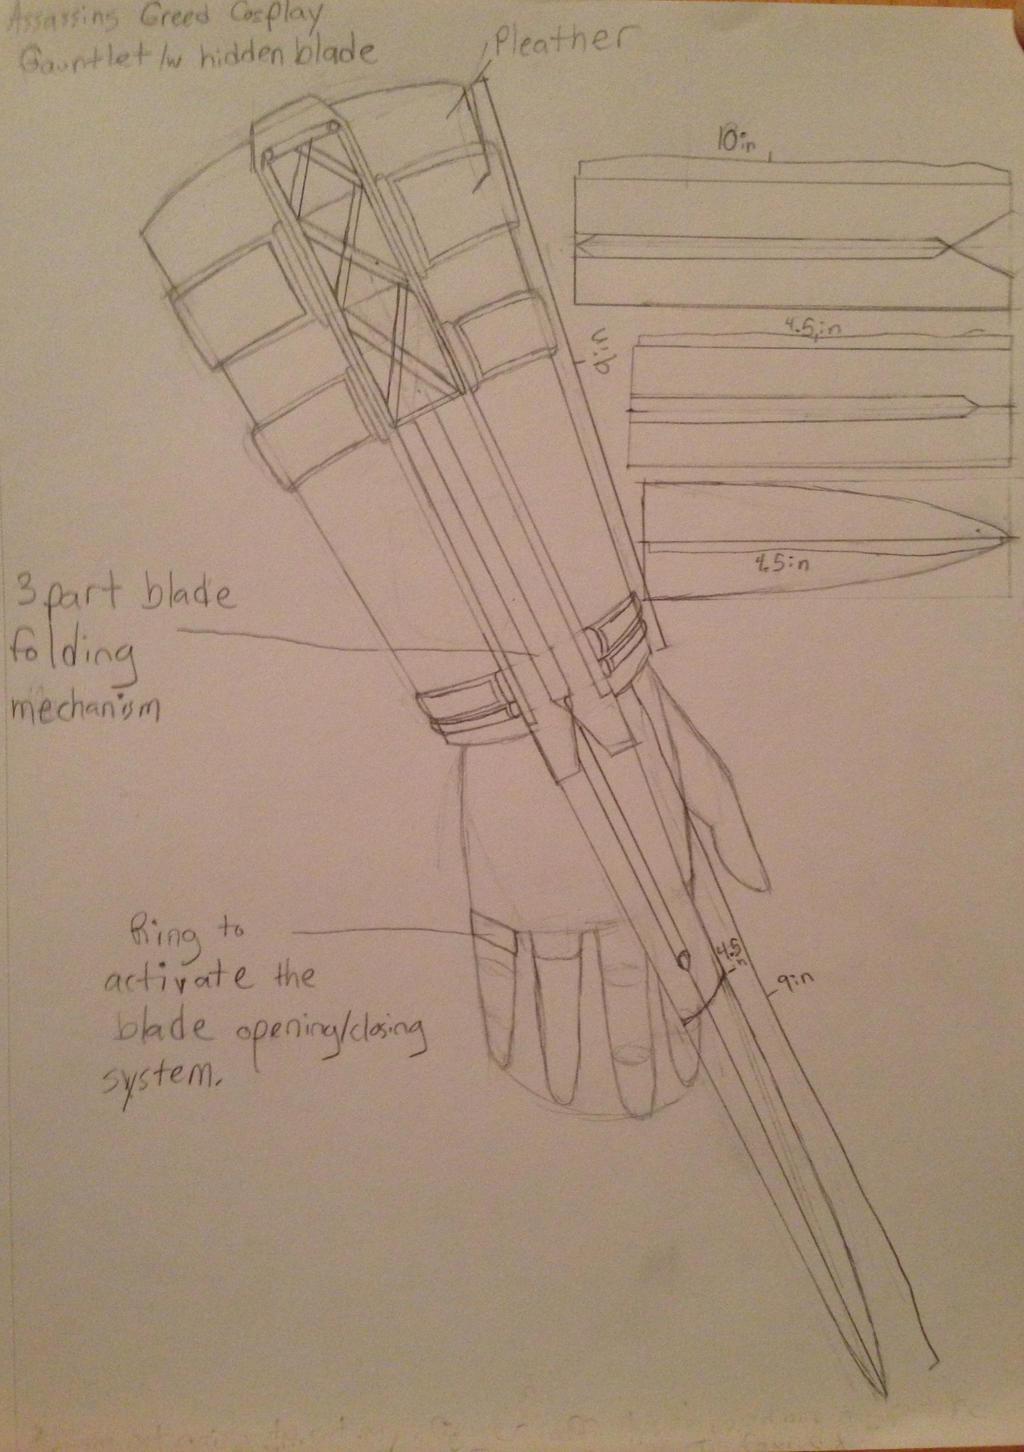 Hidden Blade Diagram Funny Wiring Diagrams Assassin Assassins Creed Gauntlet Design By Faithhollow